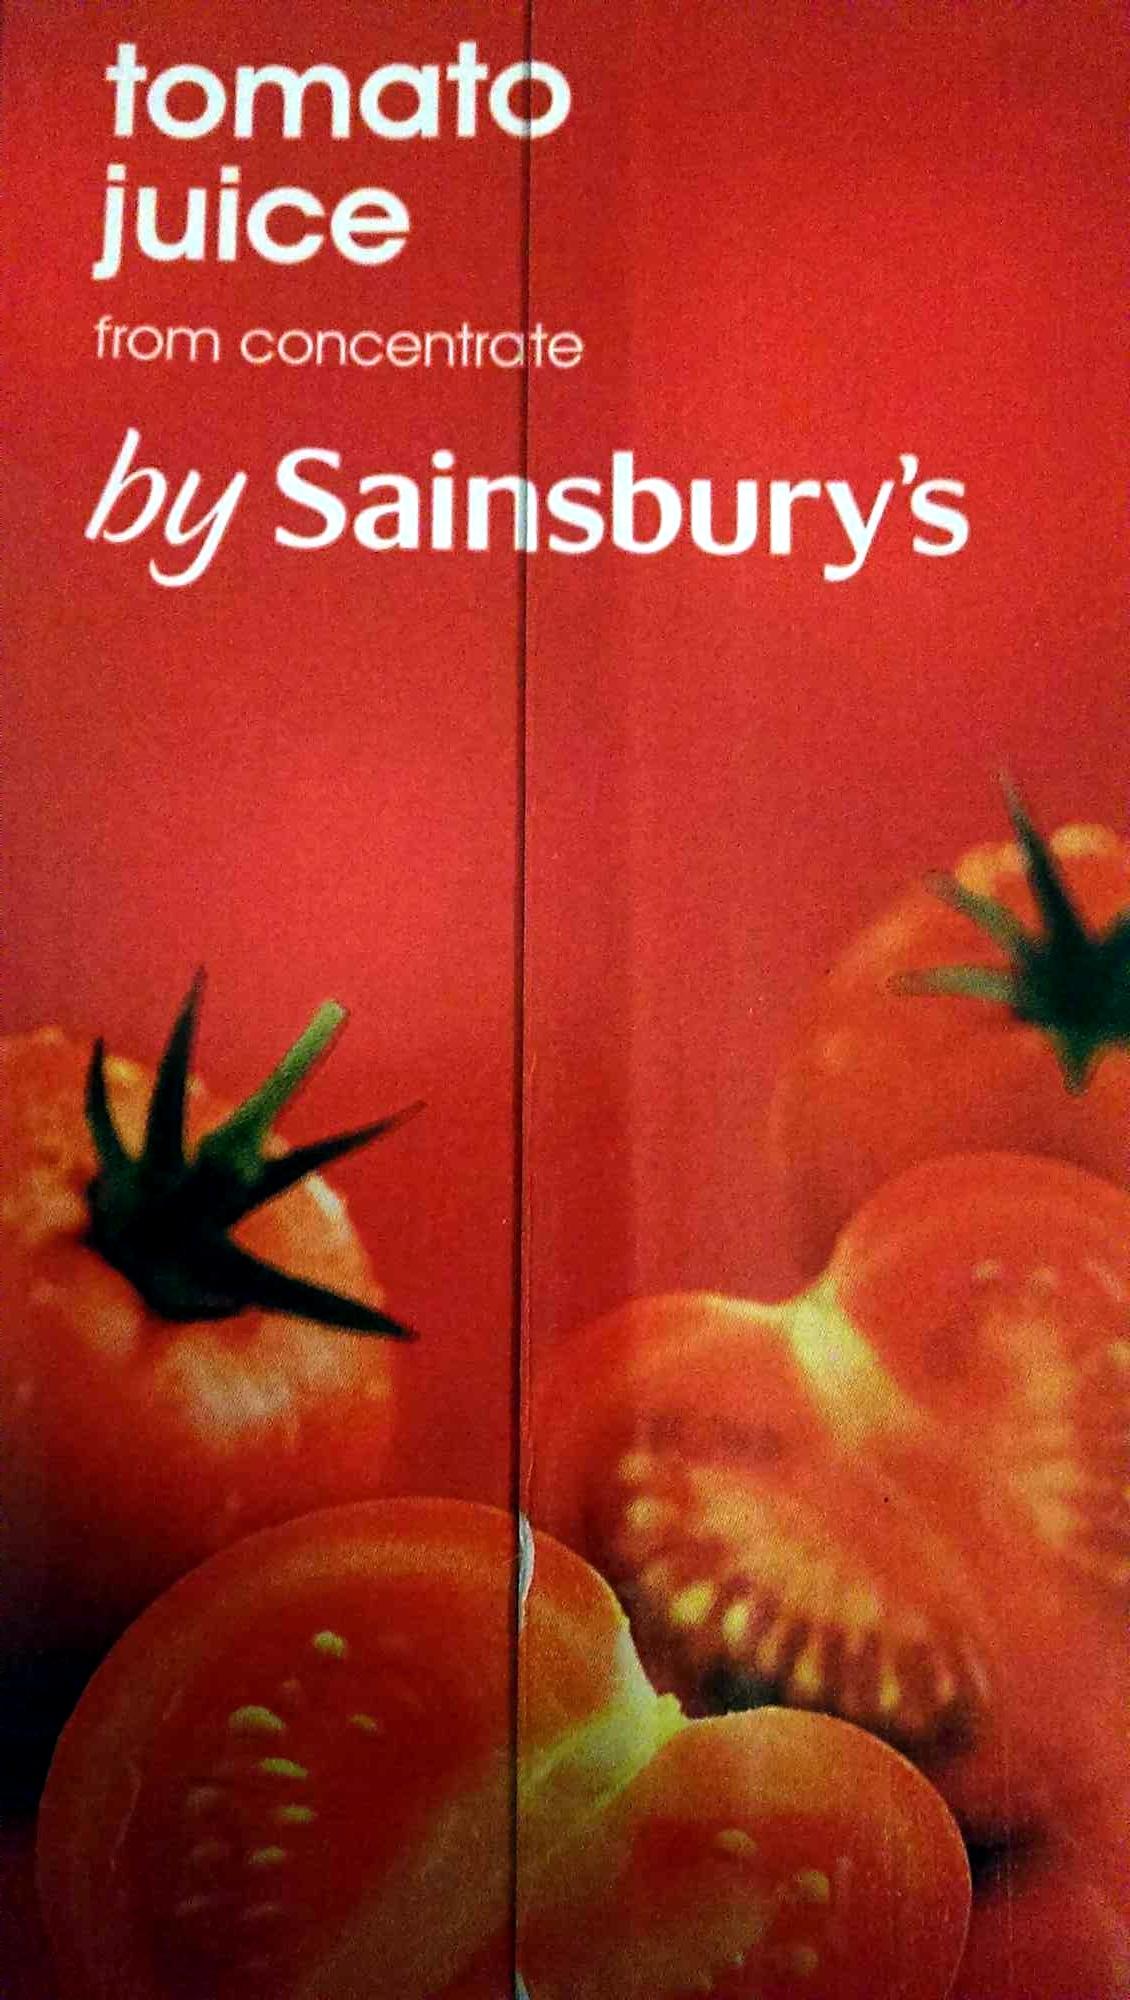 Tomato juice - Product